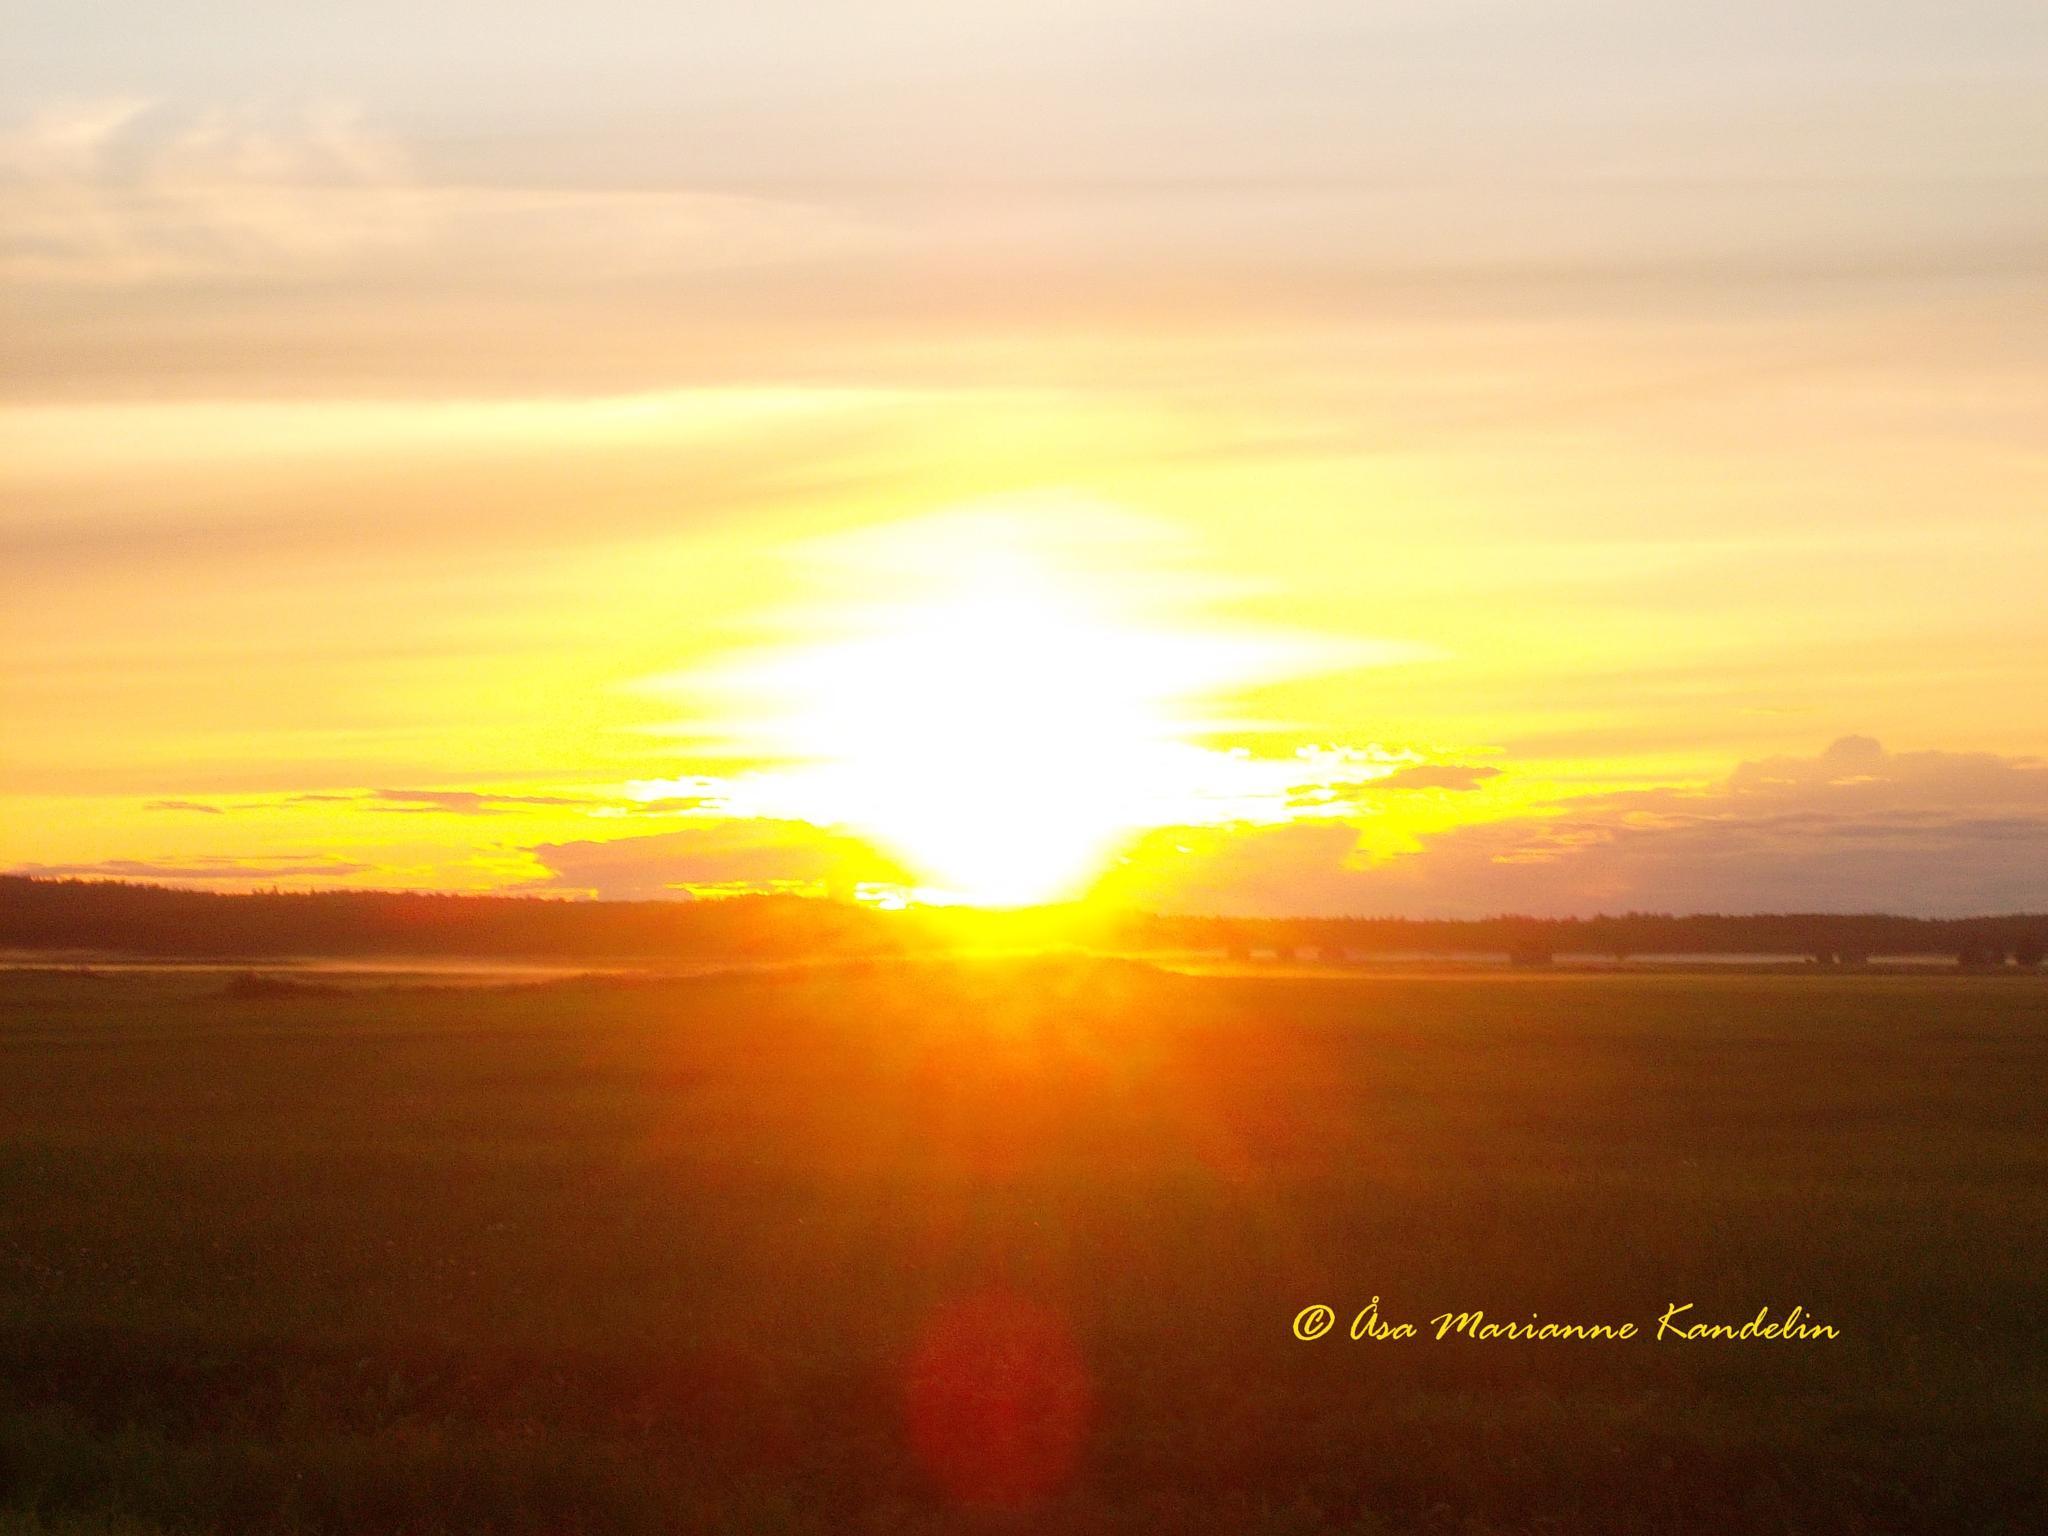 Sunset in Sweden by Marianne Kandelin